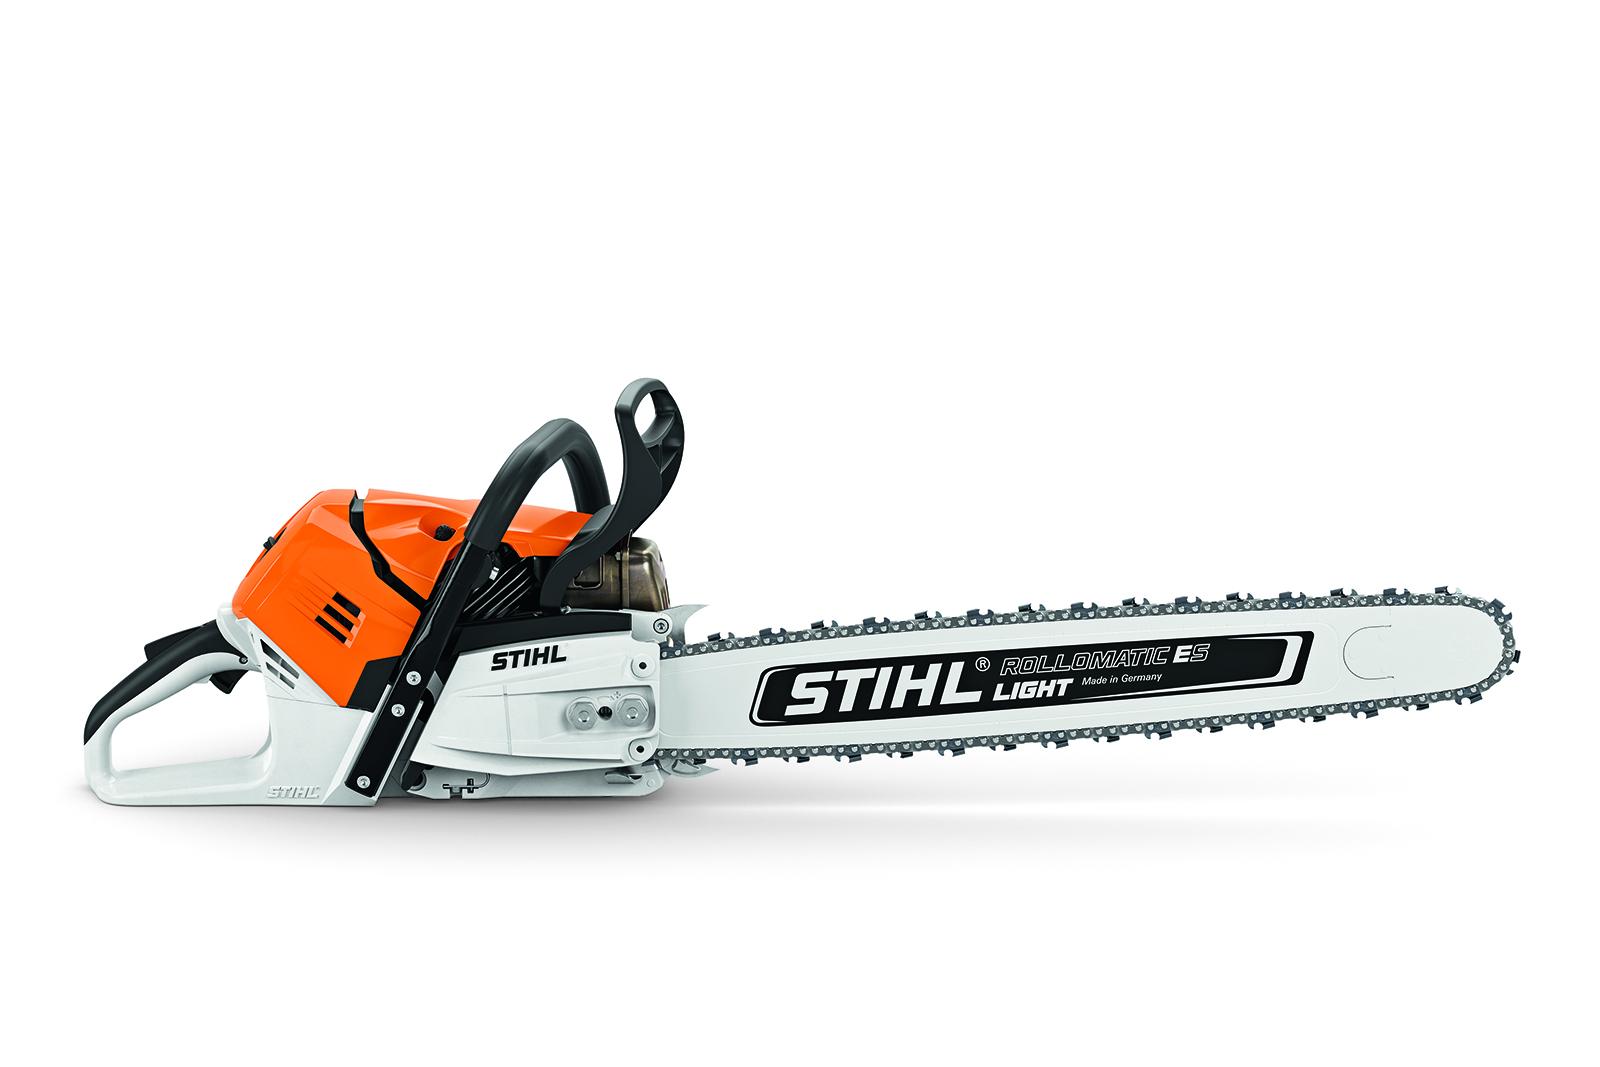 stihl's chainsaw of the future